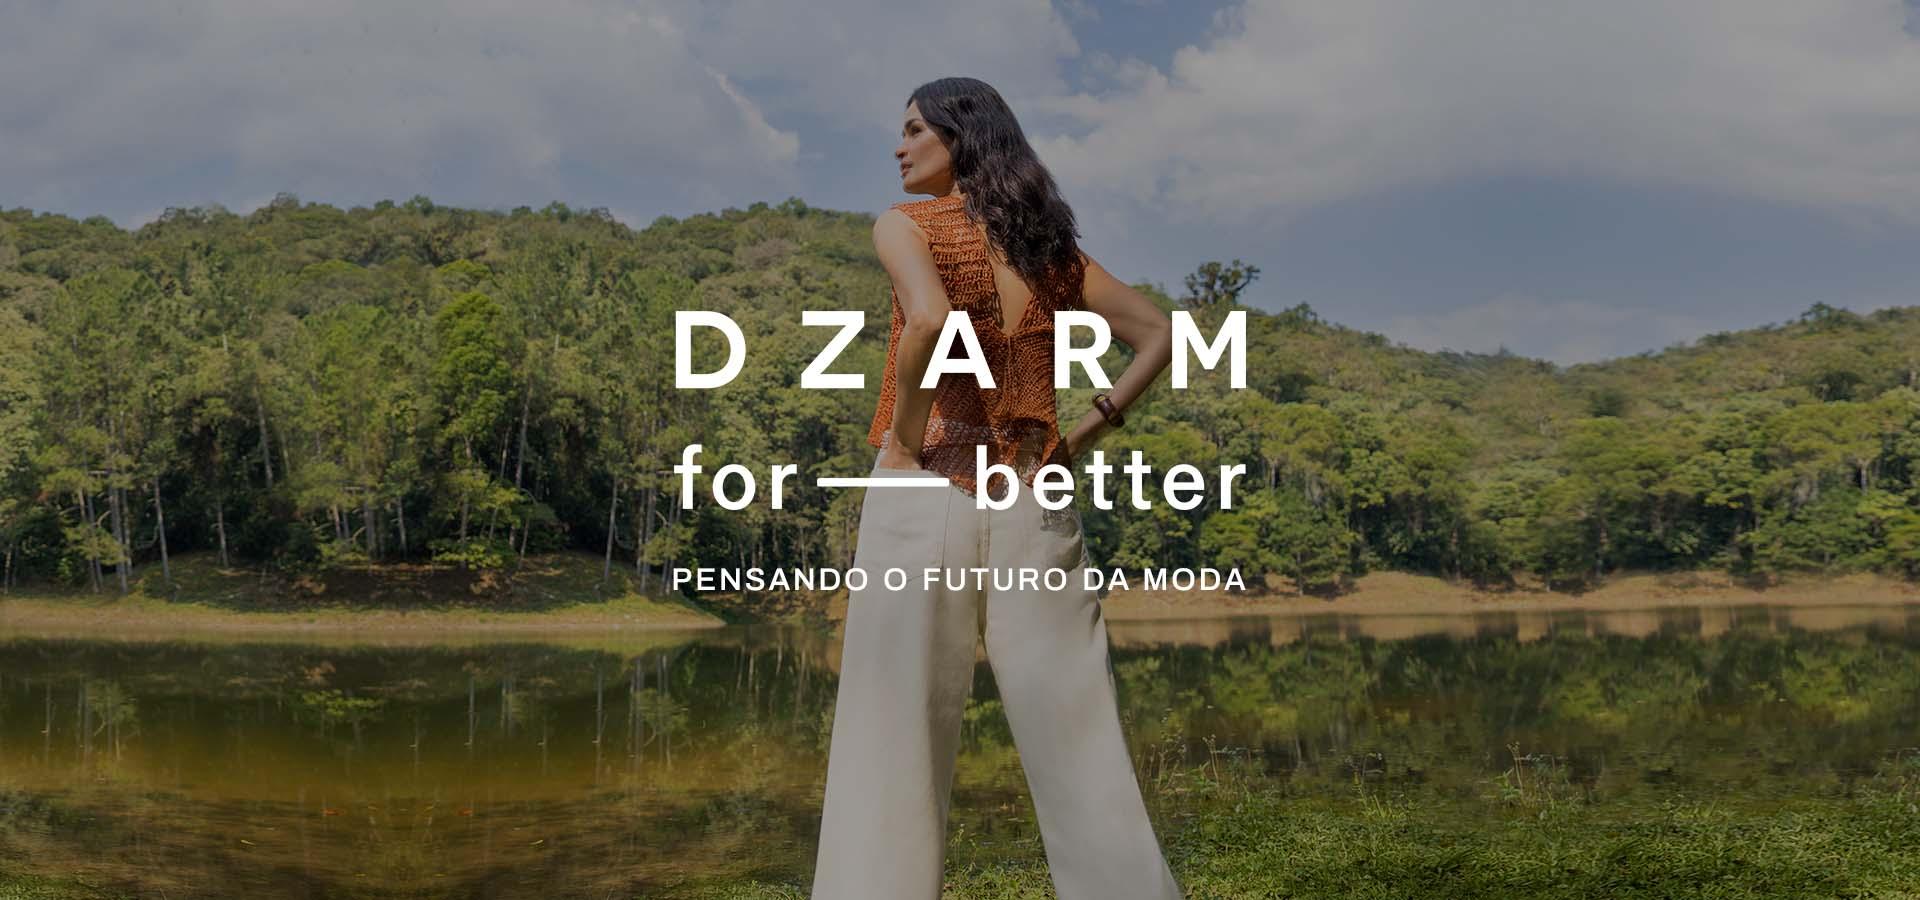 Dzarm For Better